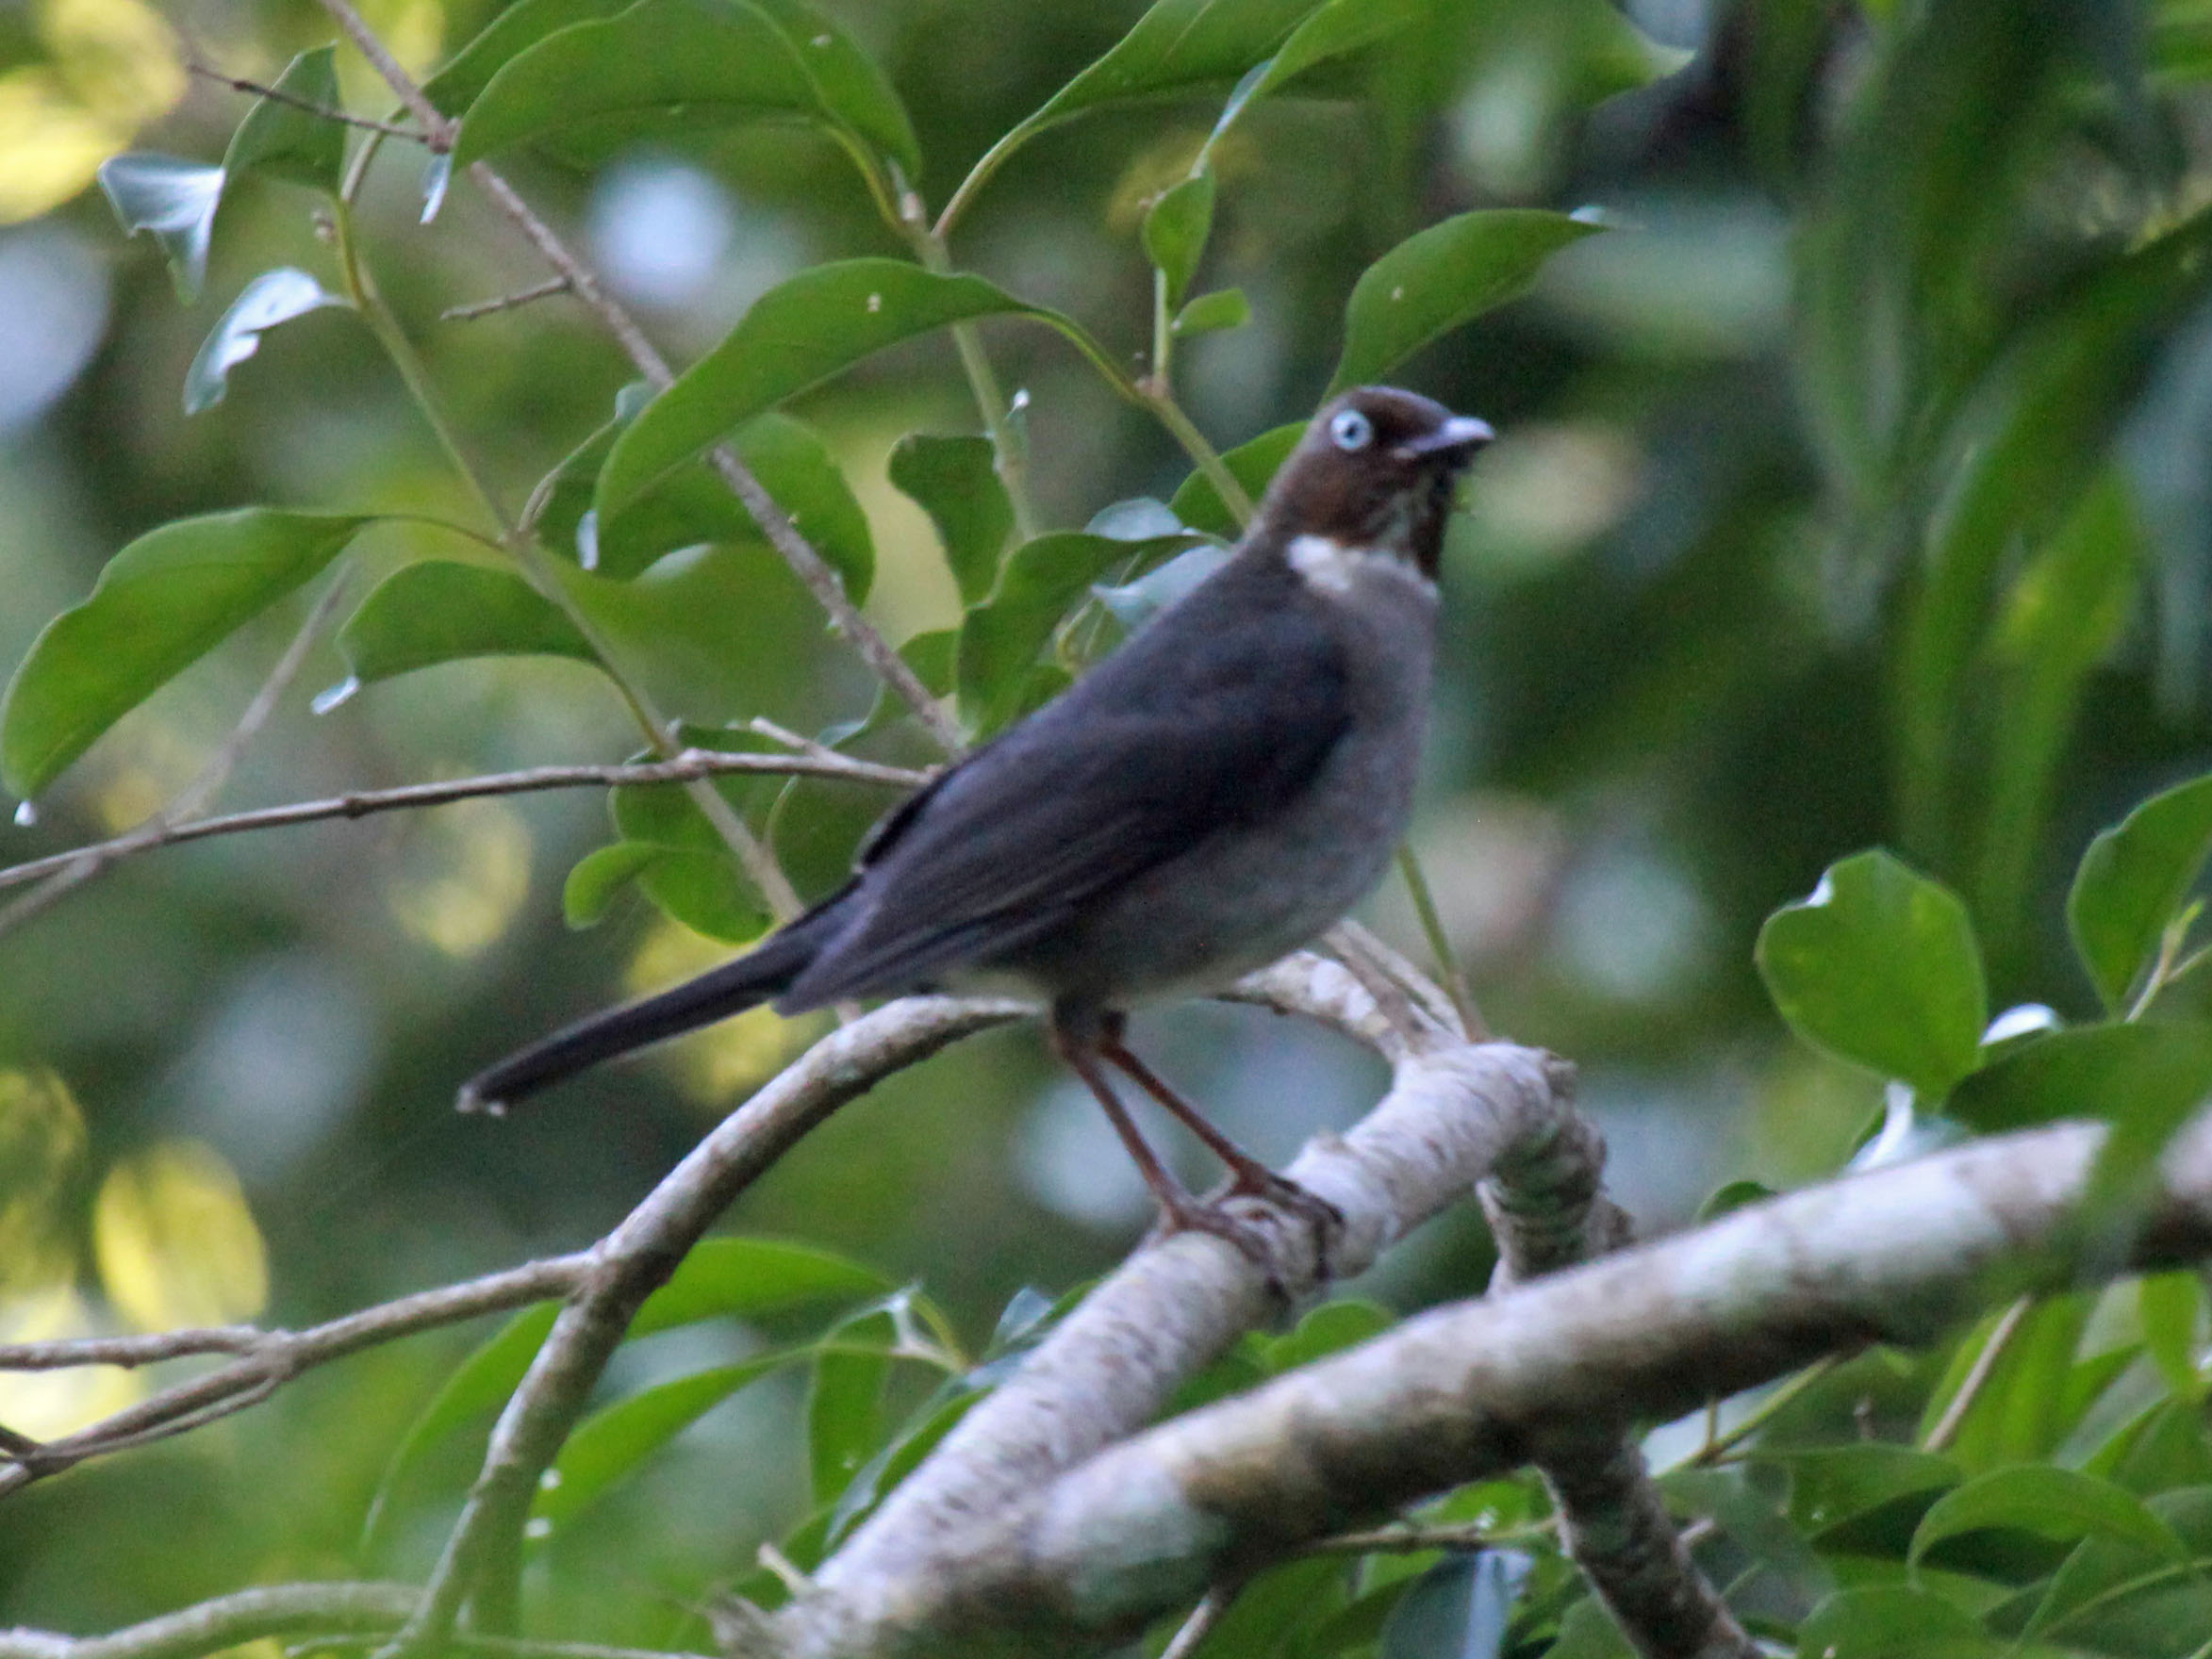 White-eyed Thrush RWD.jpg © DickDaniels (http://carolinabirds.org/)